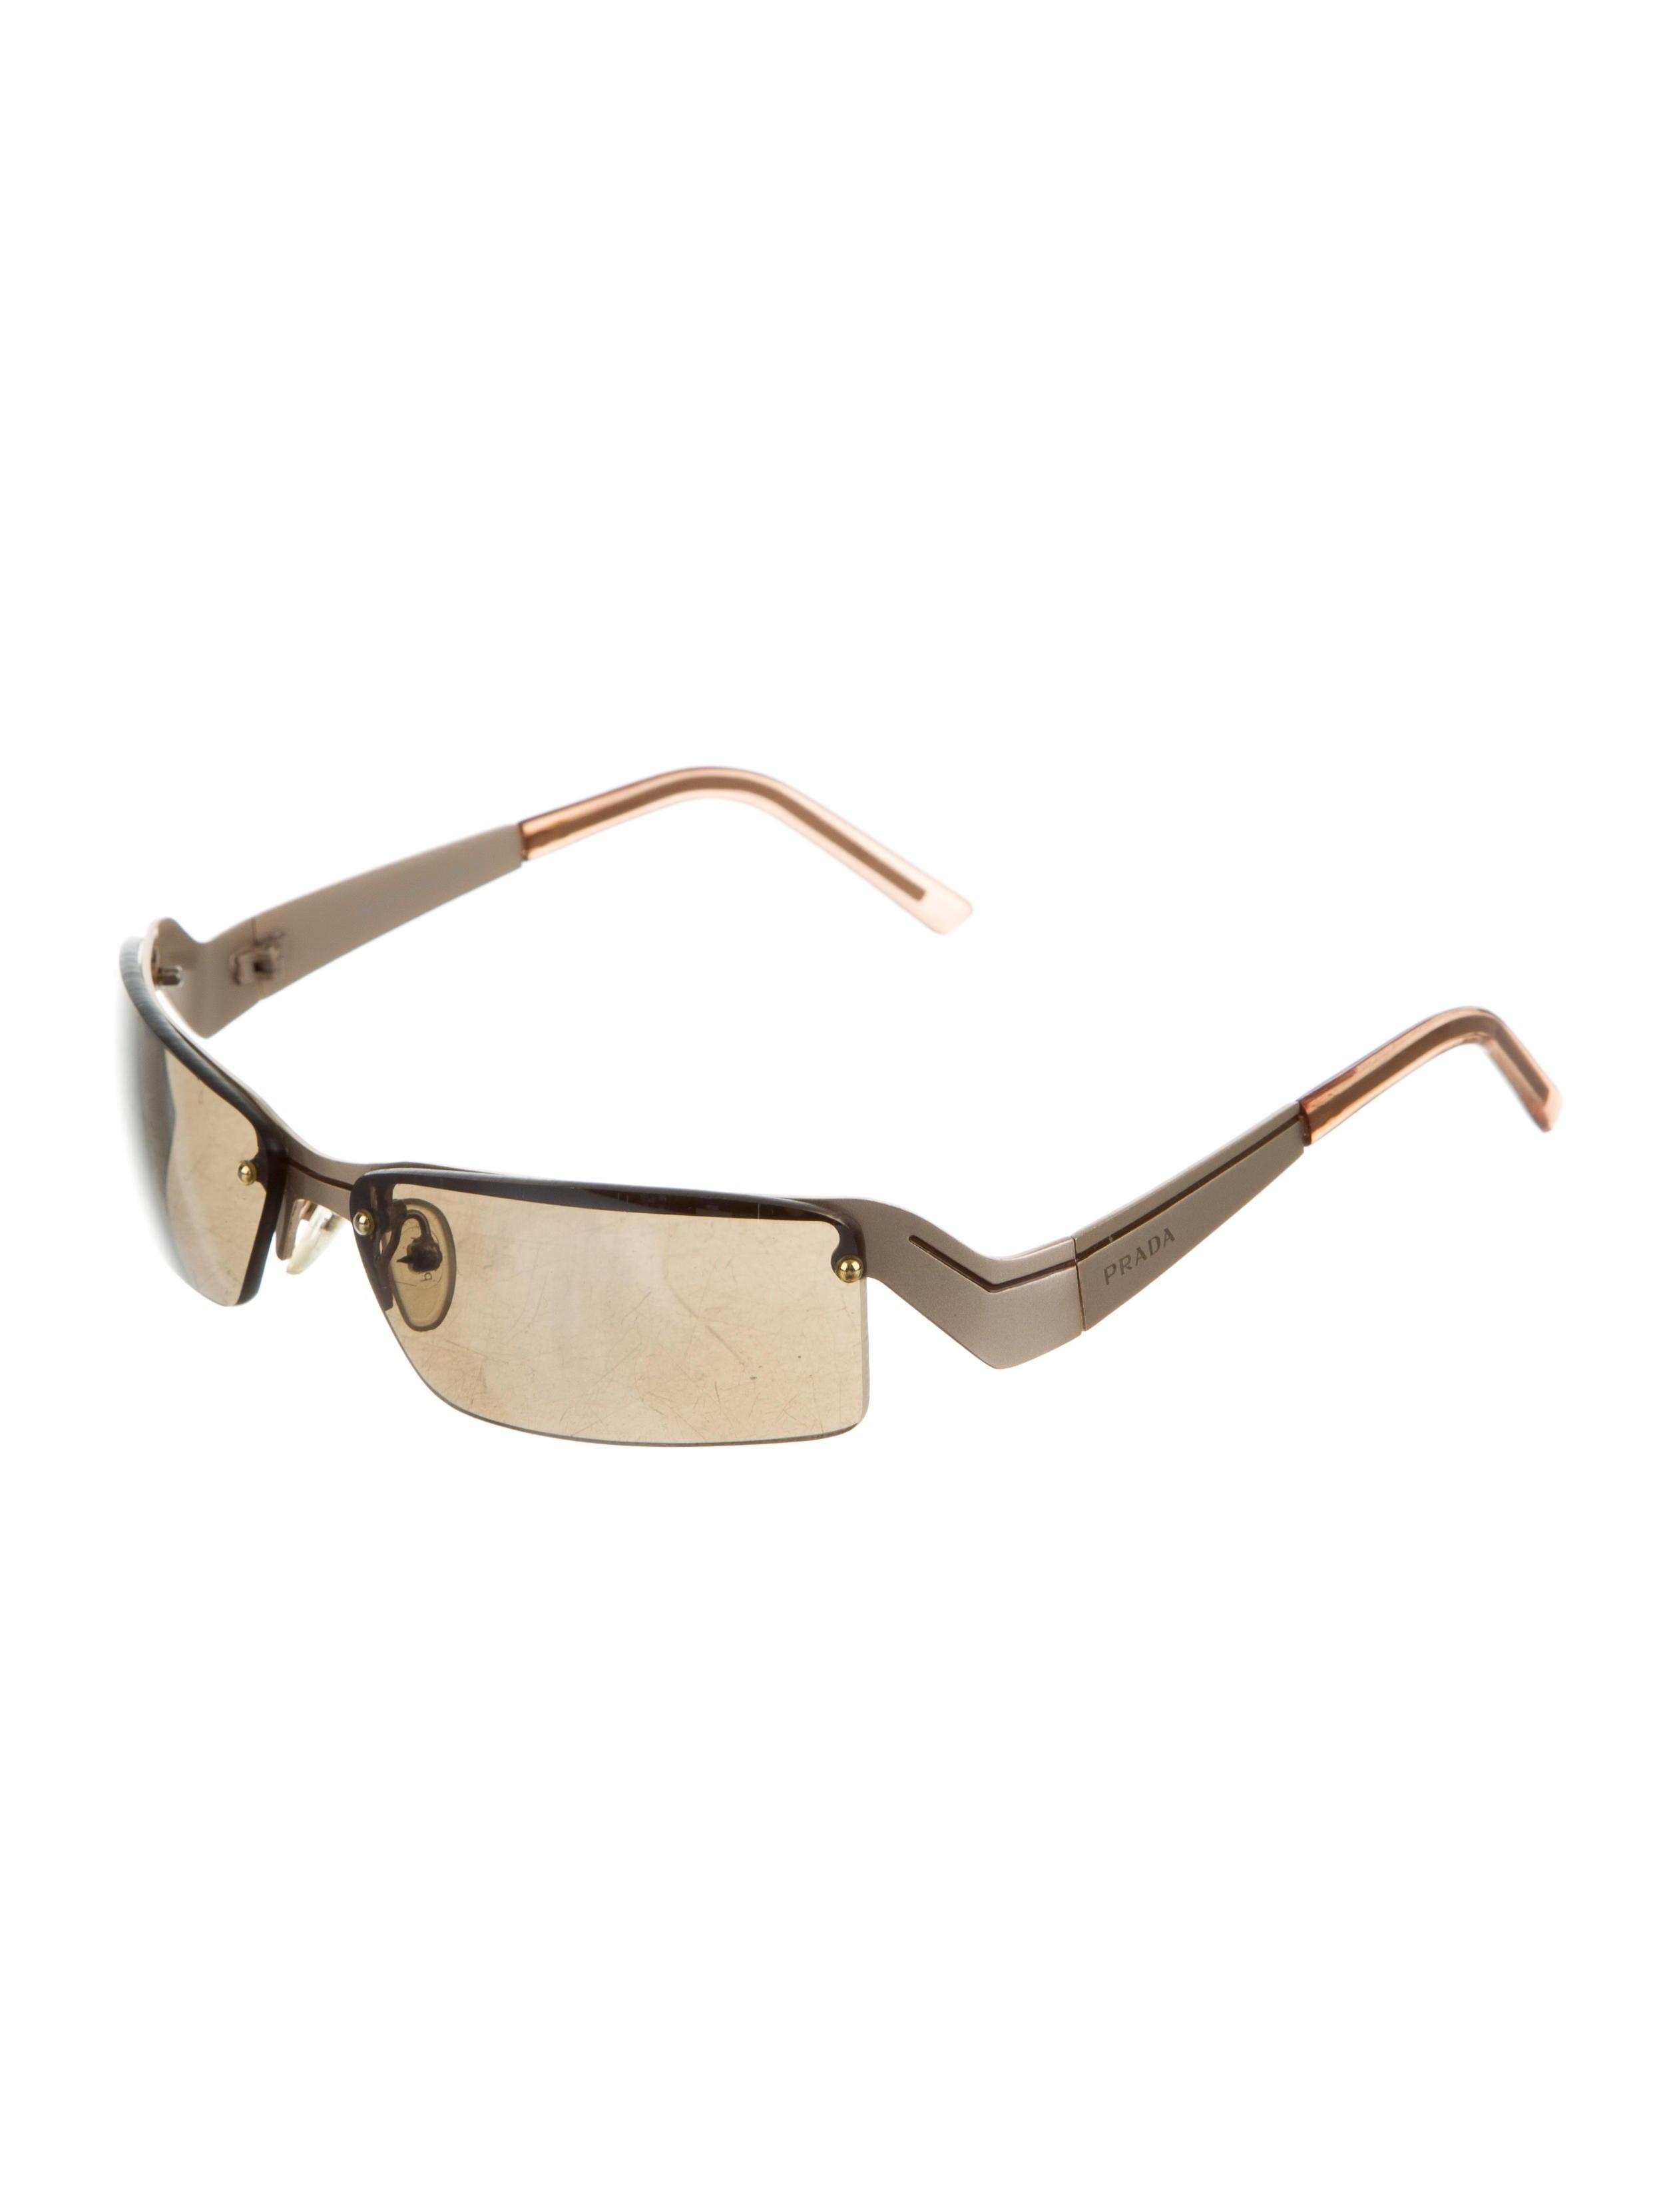 a6744f4deb88 Prada Rimless Tinted Sunglasses - Accessories - PRA150064